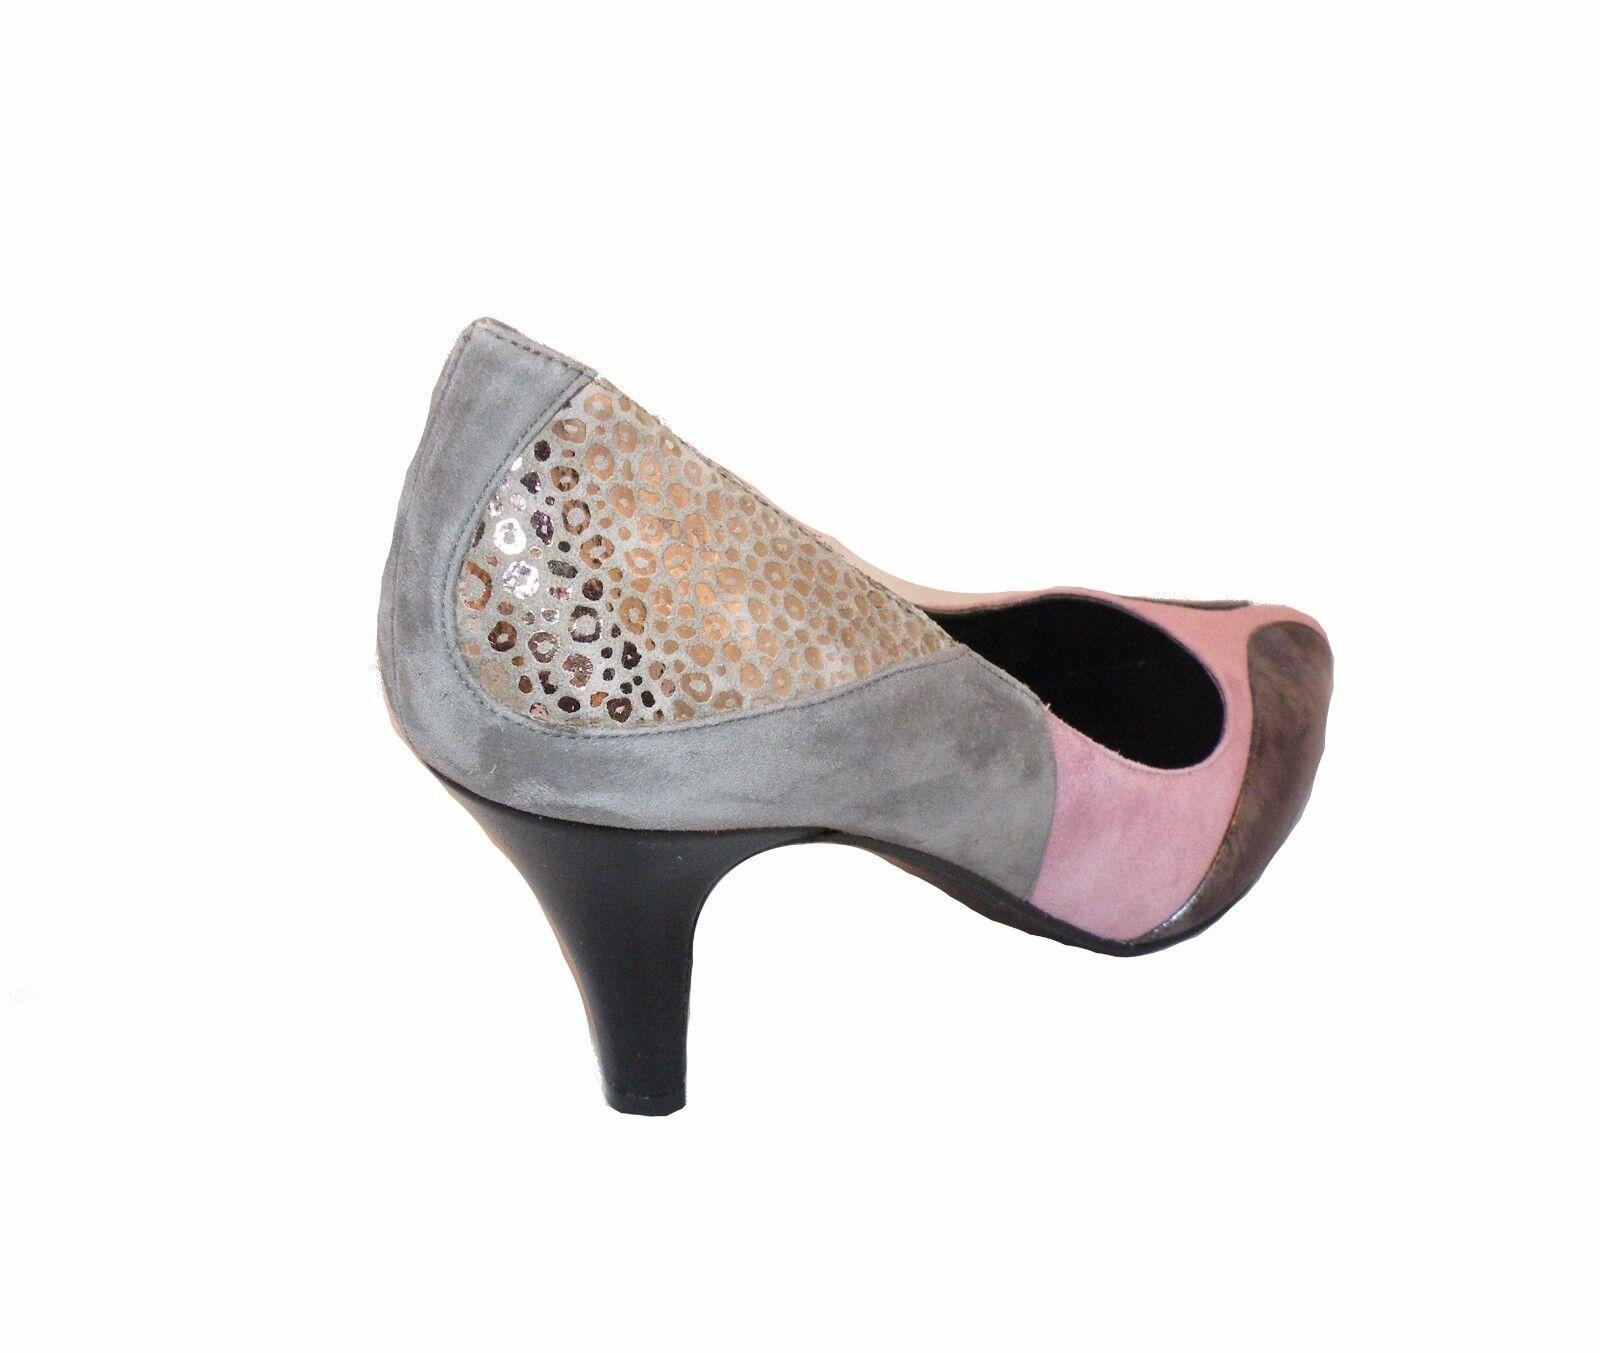 Heine Pumps Leder grau rose silber 37 metallic Damenschuhe Gr.  37 silber 38 40 41 42 43 882b2f